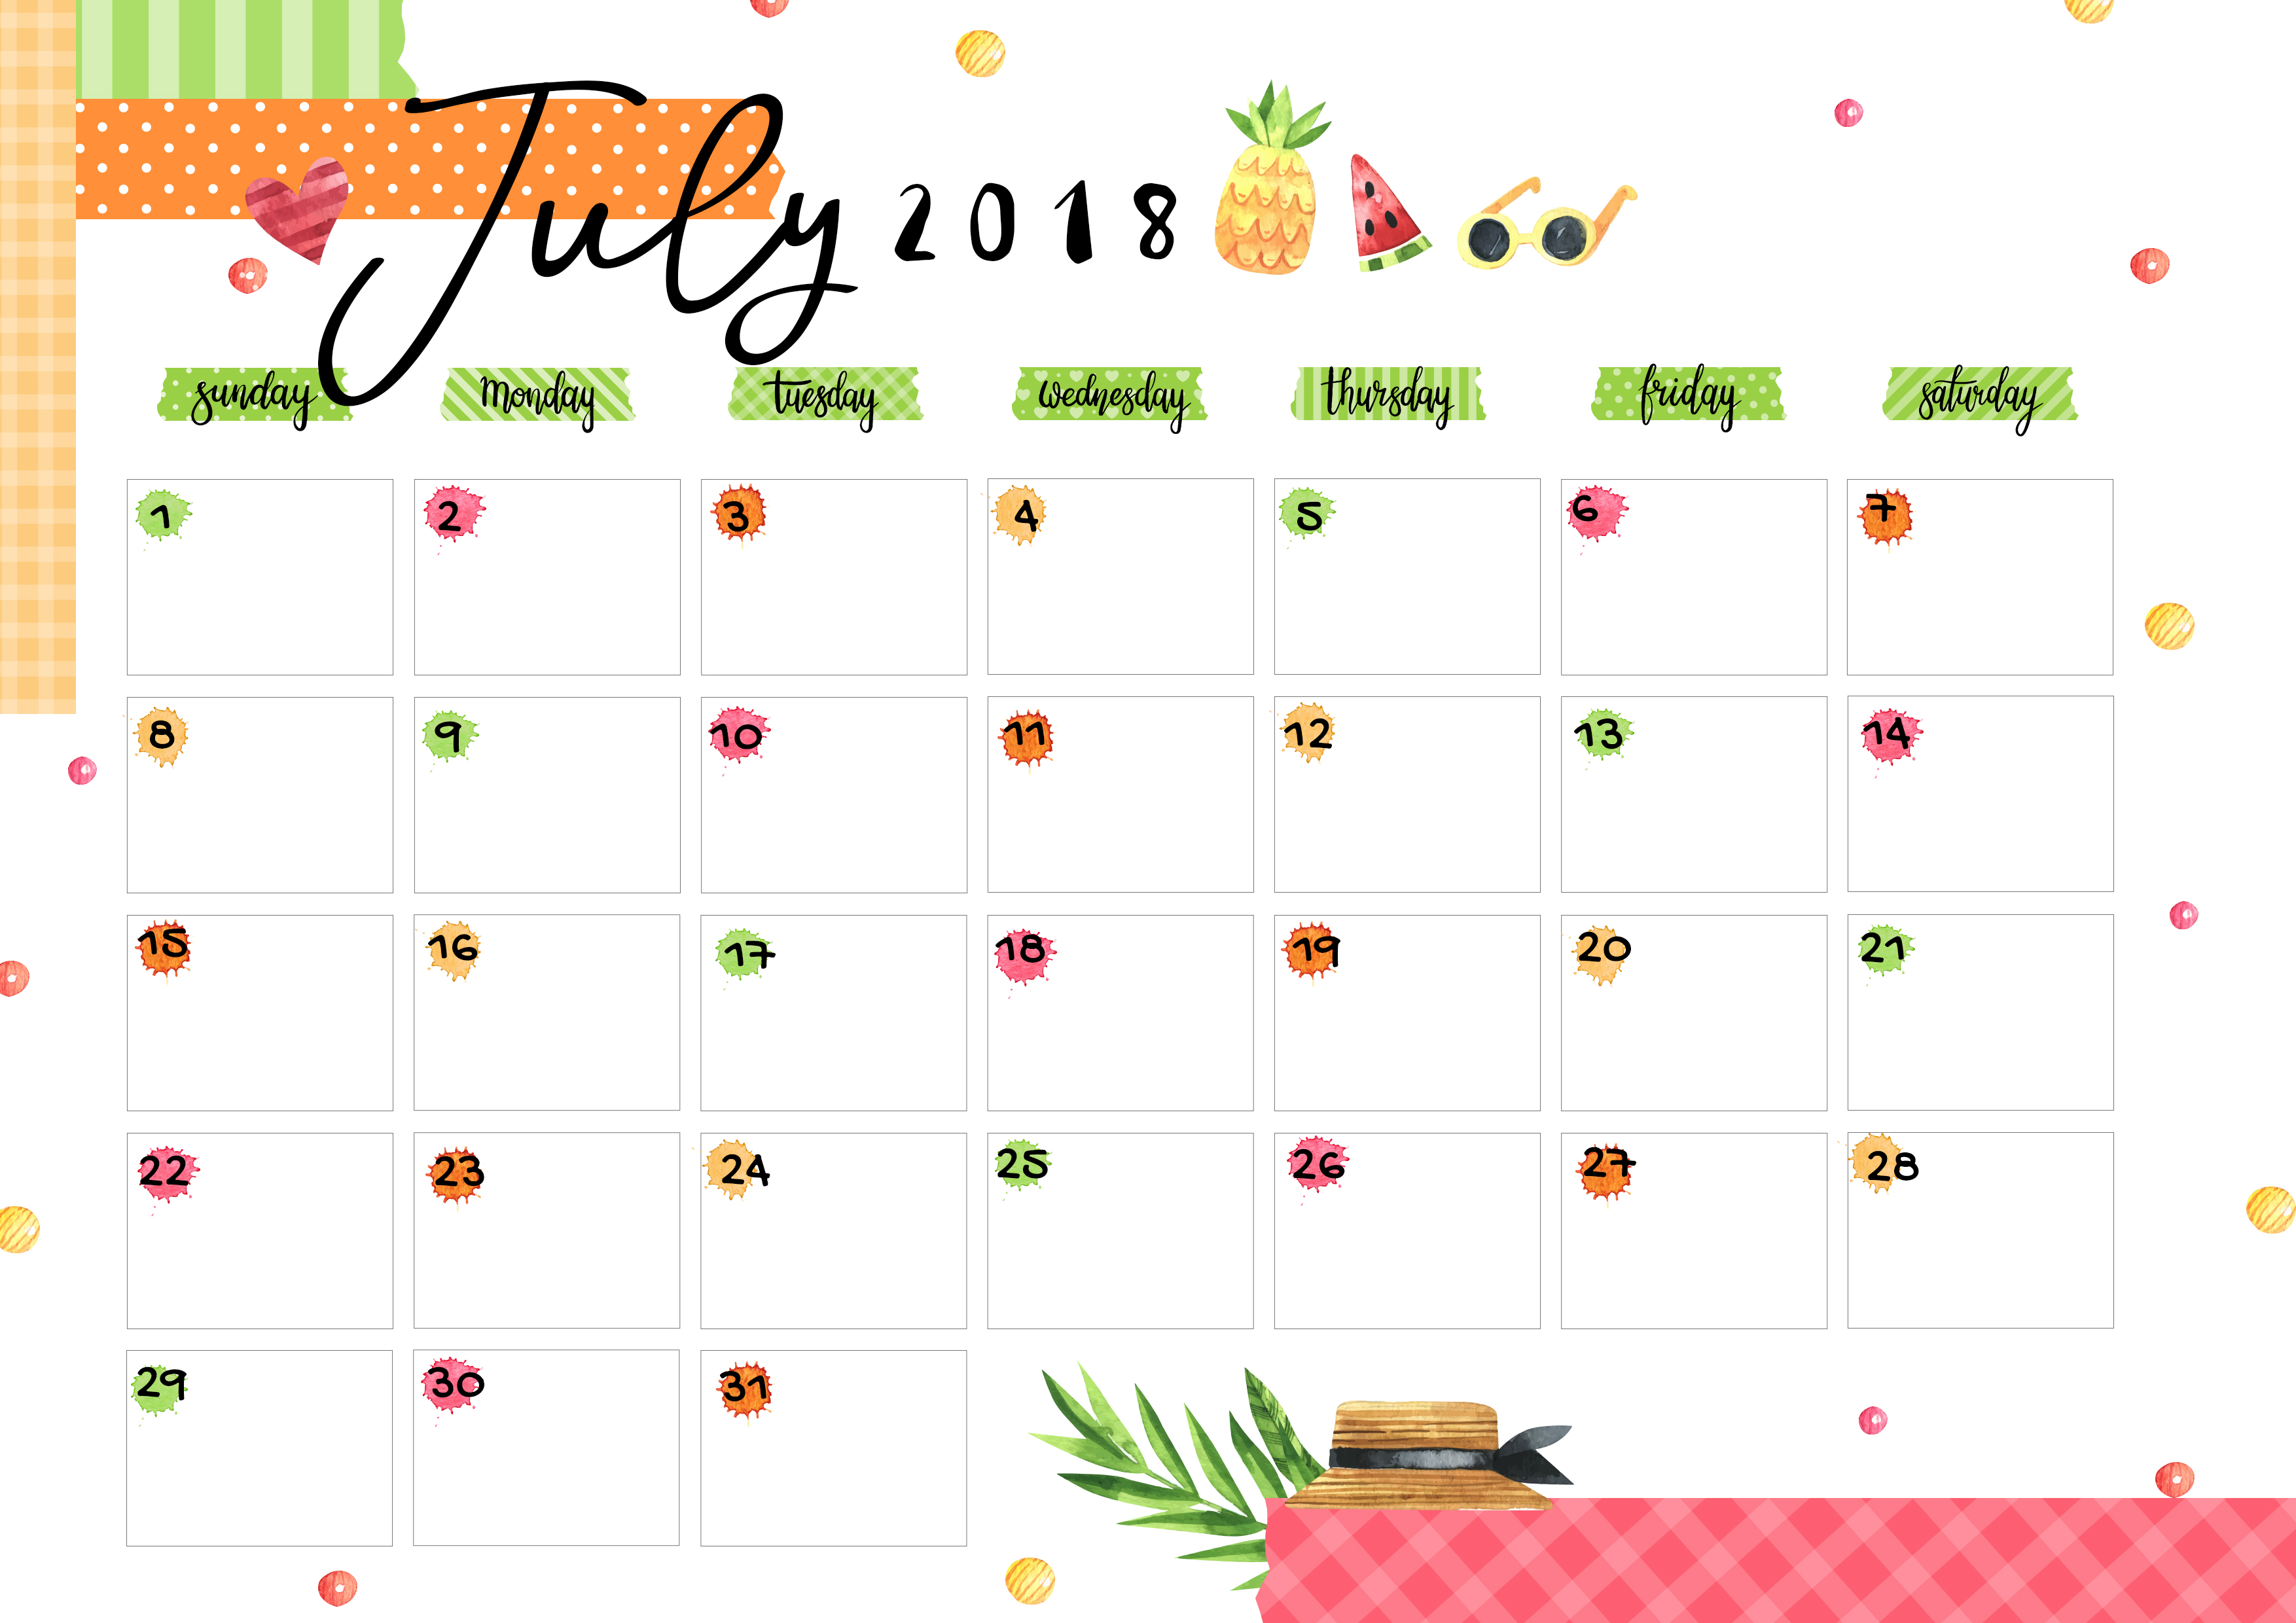 July 2018 Printable Colorful Calendar